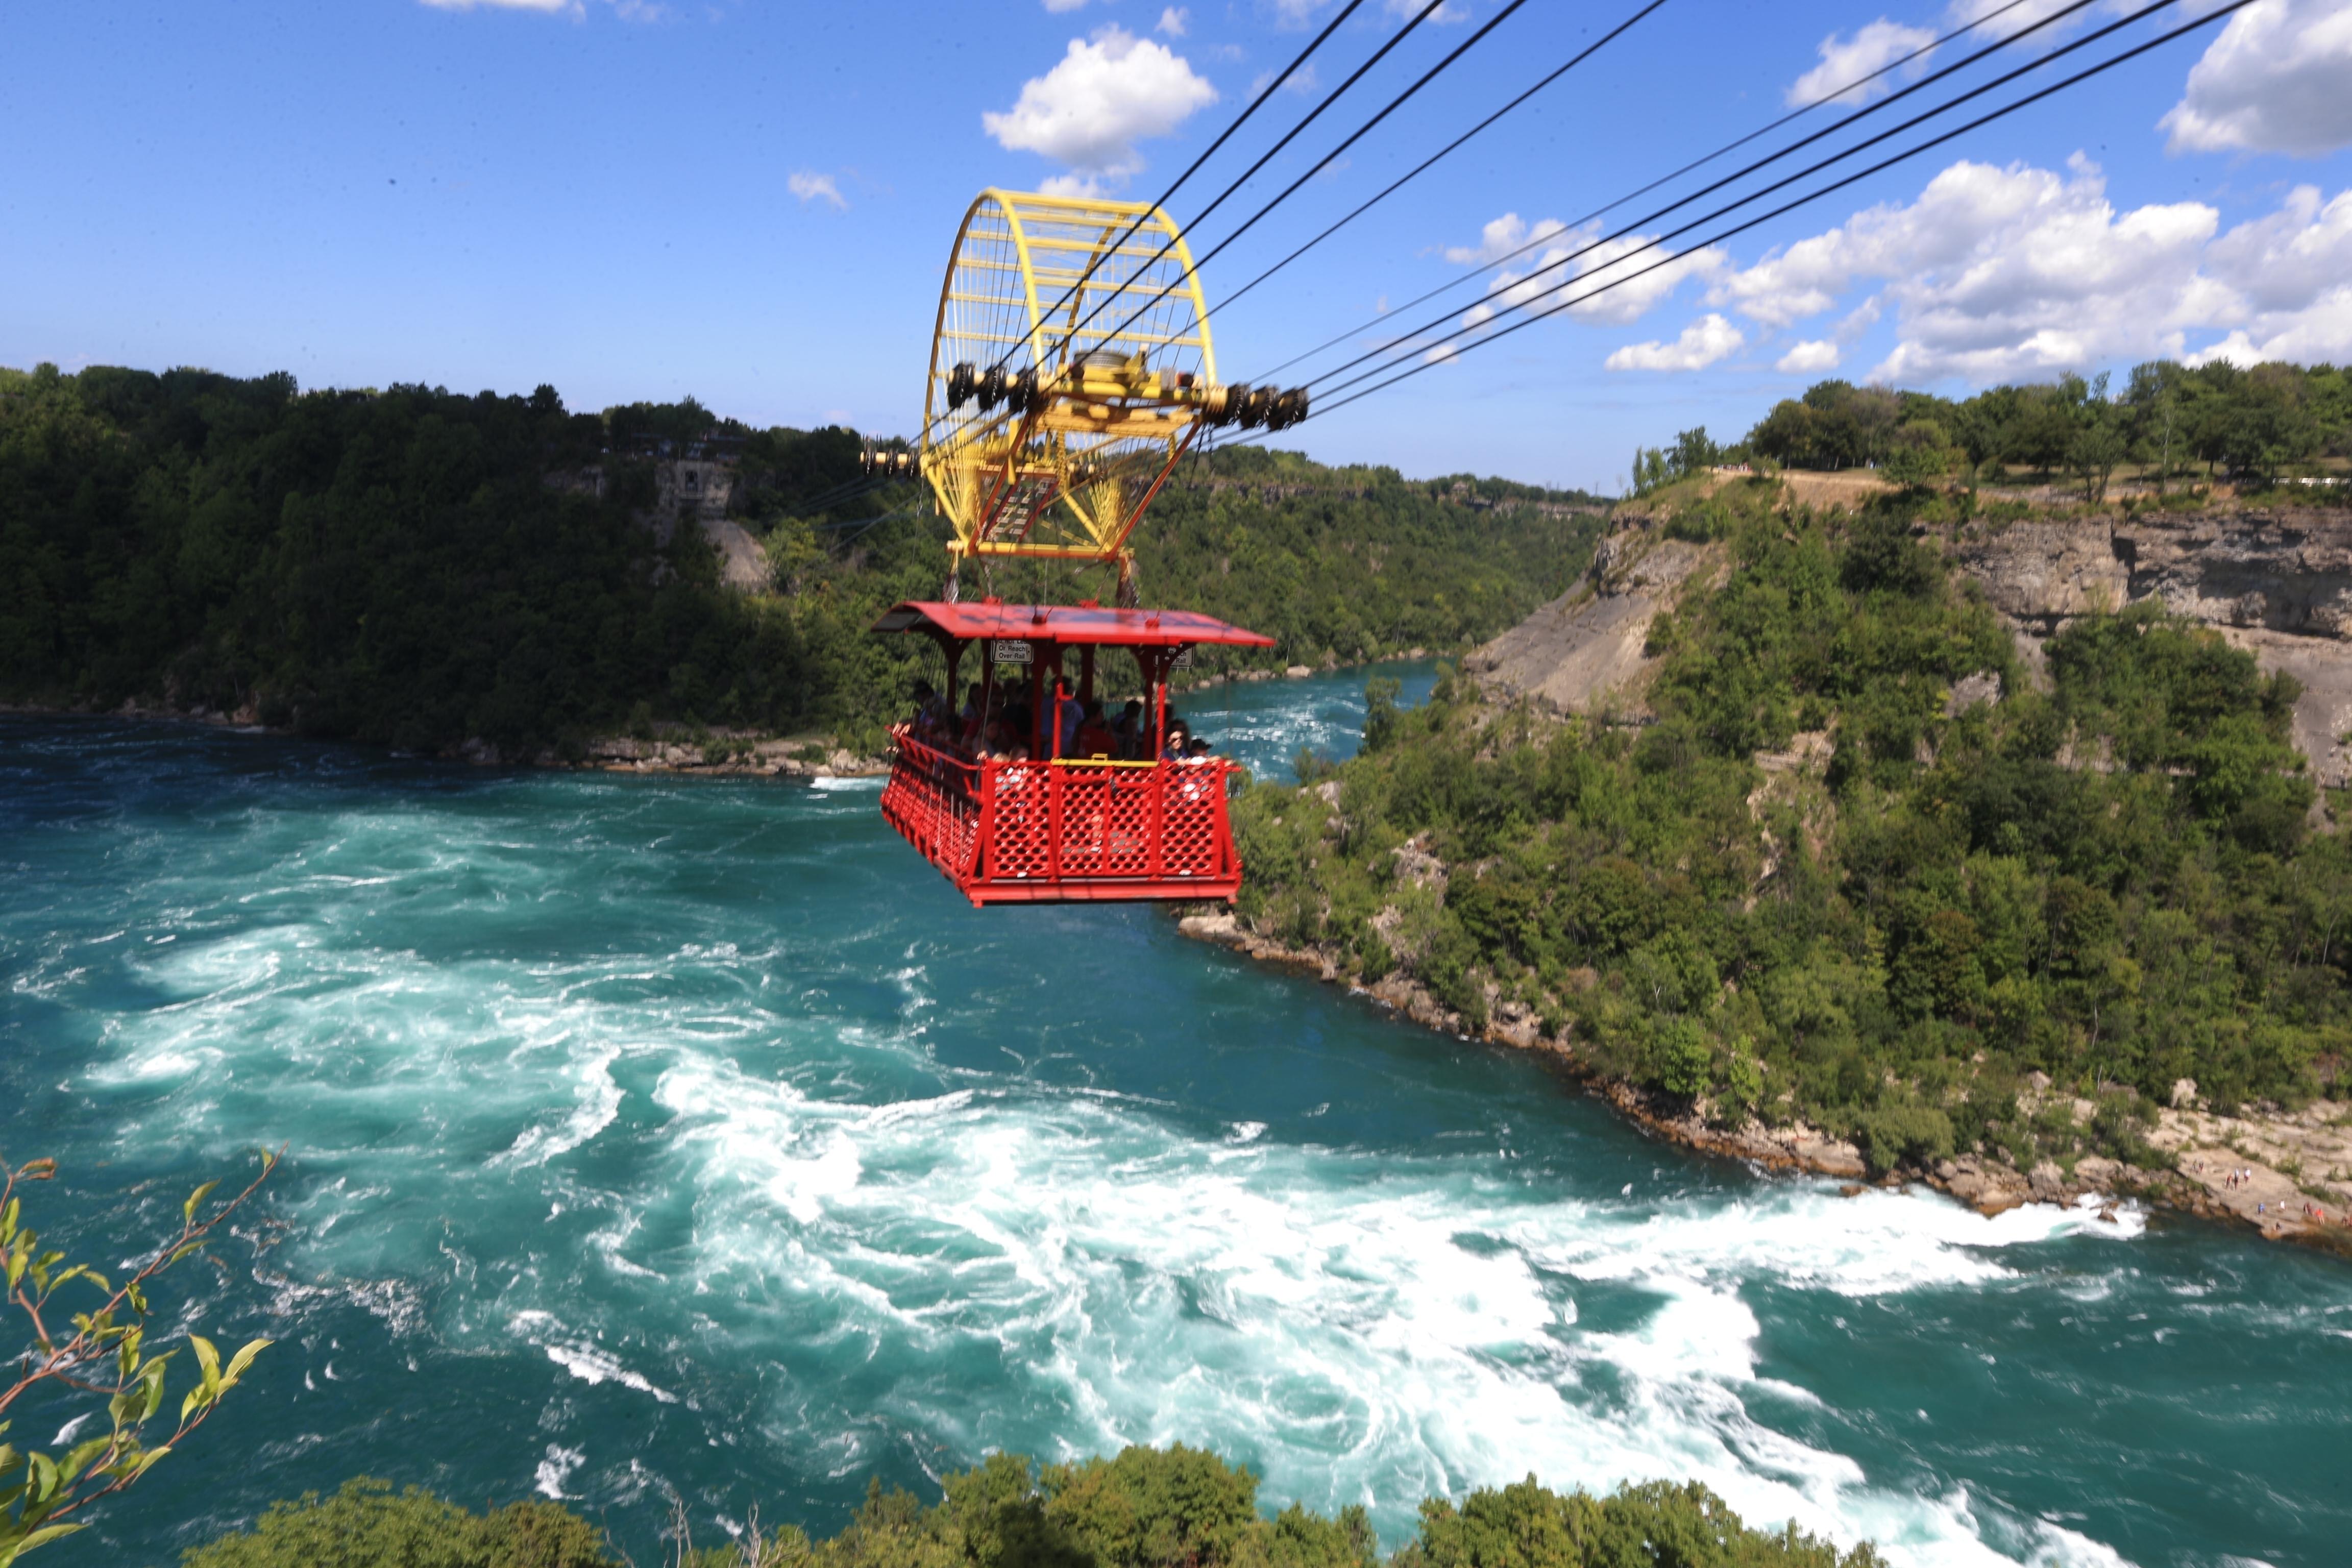 Tourists and visitors to Niagara Falls ride the Whirlpool Aero Car, or Spanish Aero Car, above the Whirlpool Rapids of the Lower Niagara River on Sunday, Aug. 7, 2016. (John Hickey/Buffalo News)